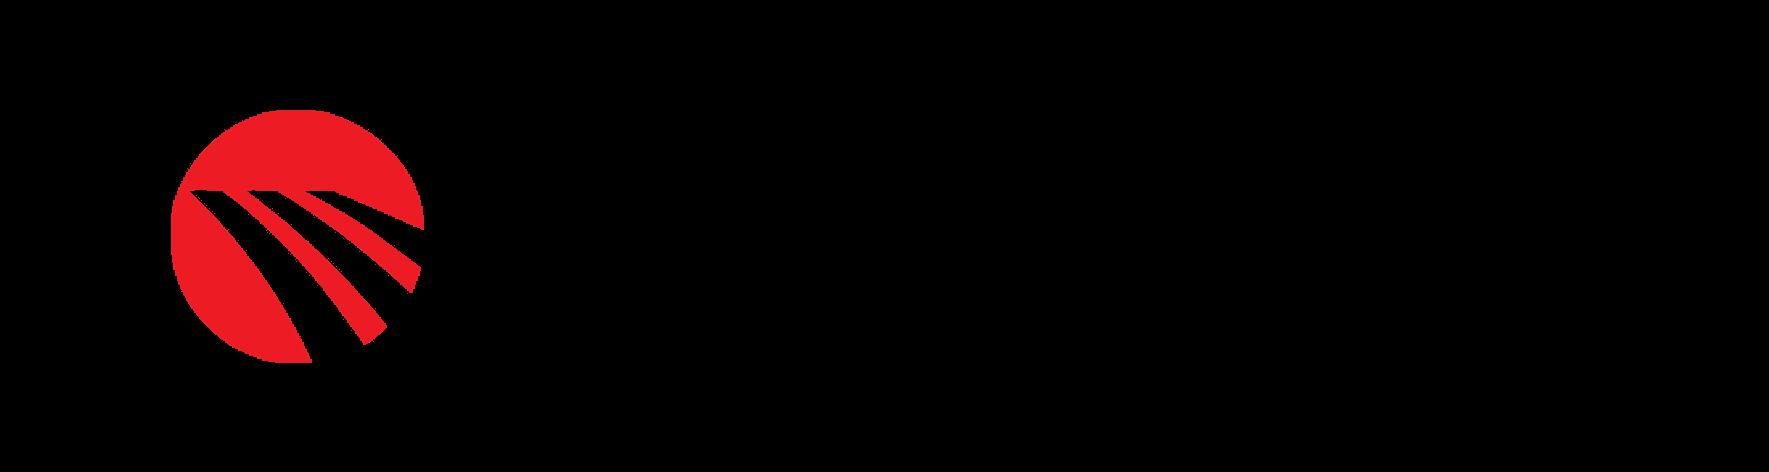 mantovanibenne_centro_cores